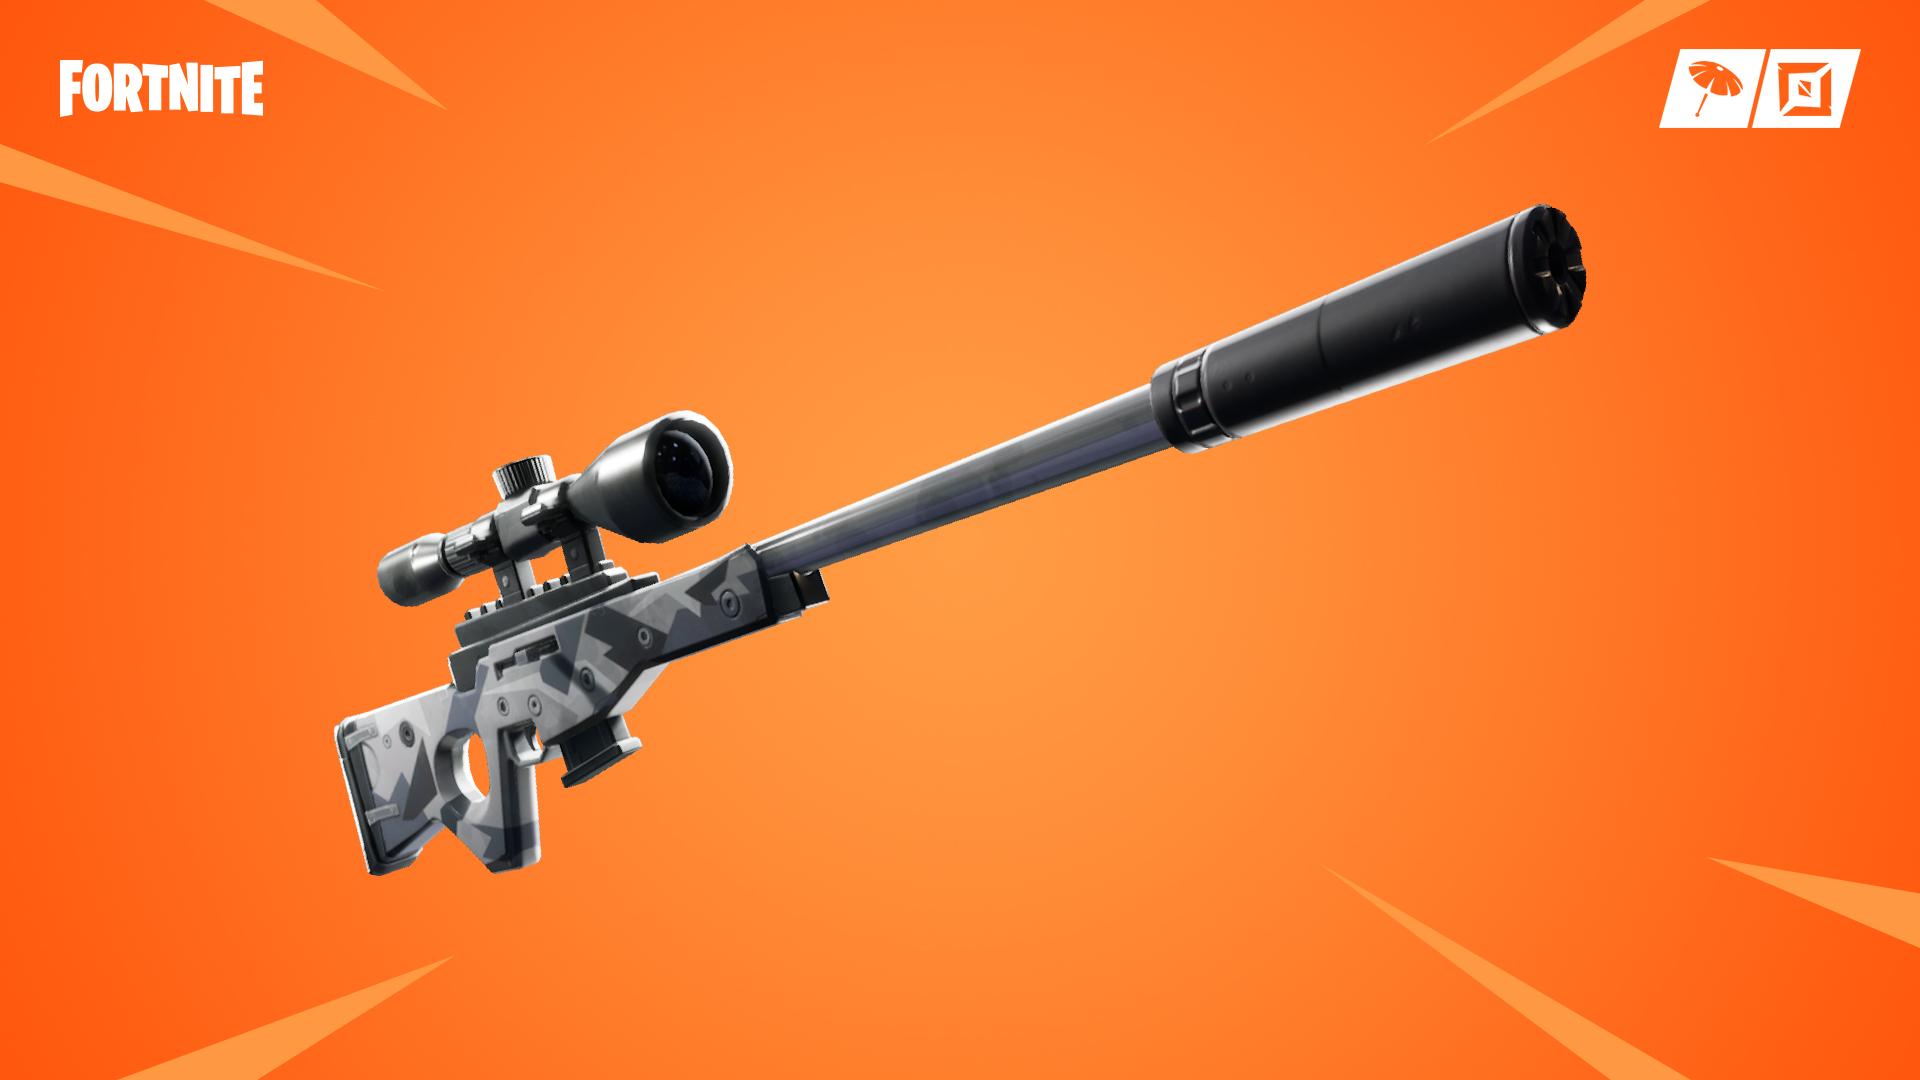 Fortnite, suppressed sniper rifle, v7.10 update